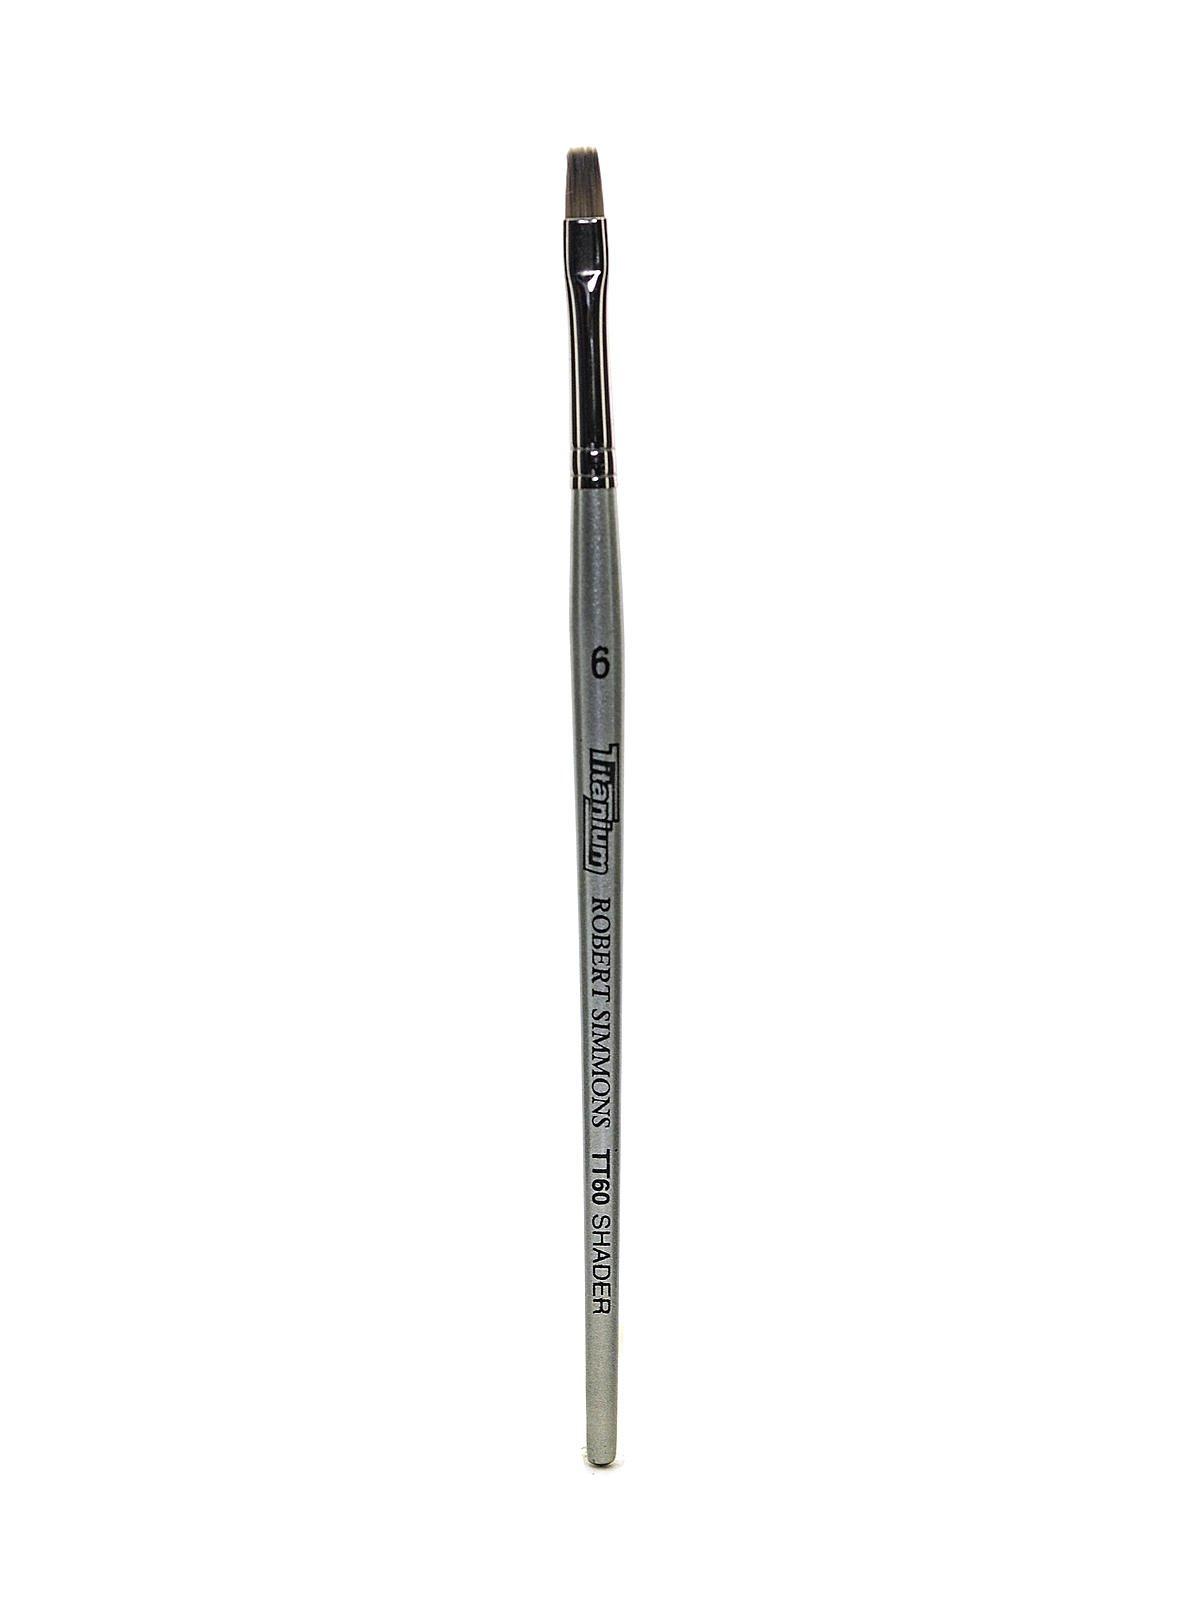 Robert Simmons Titanium Brushes Short Handle Single Stock 6 flat shader TT60 [PACK OF 2 ]